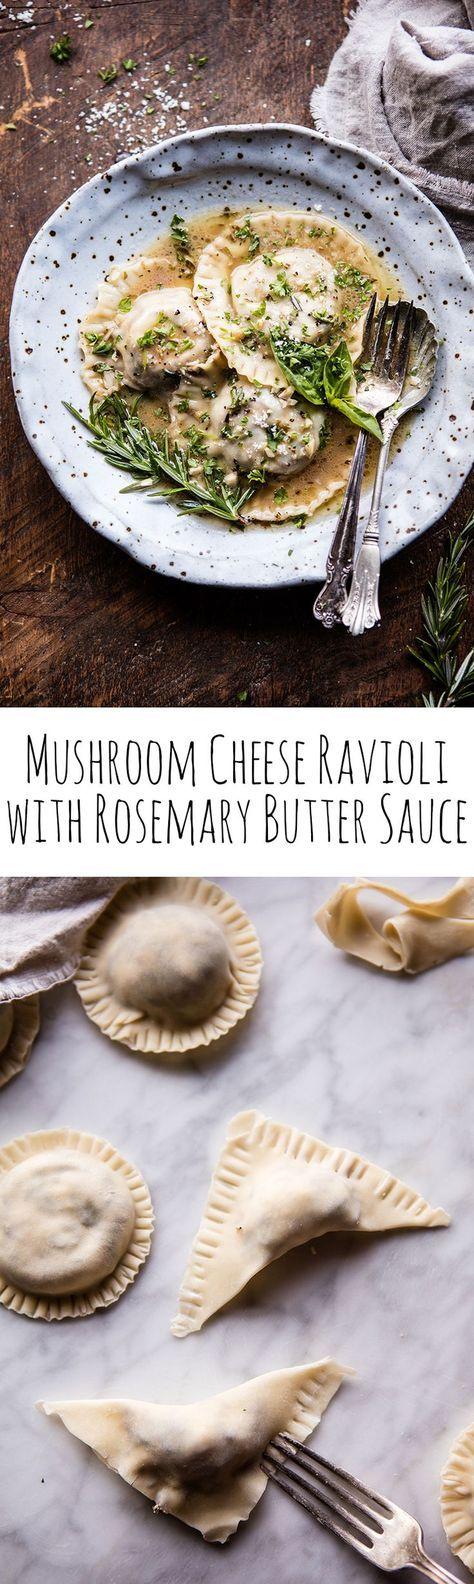 Mushroom Cheese Ravioli with Rosemary Butter Sauce | http://halfbakedharvest.com /hbharvest/